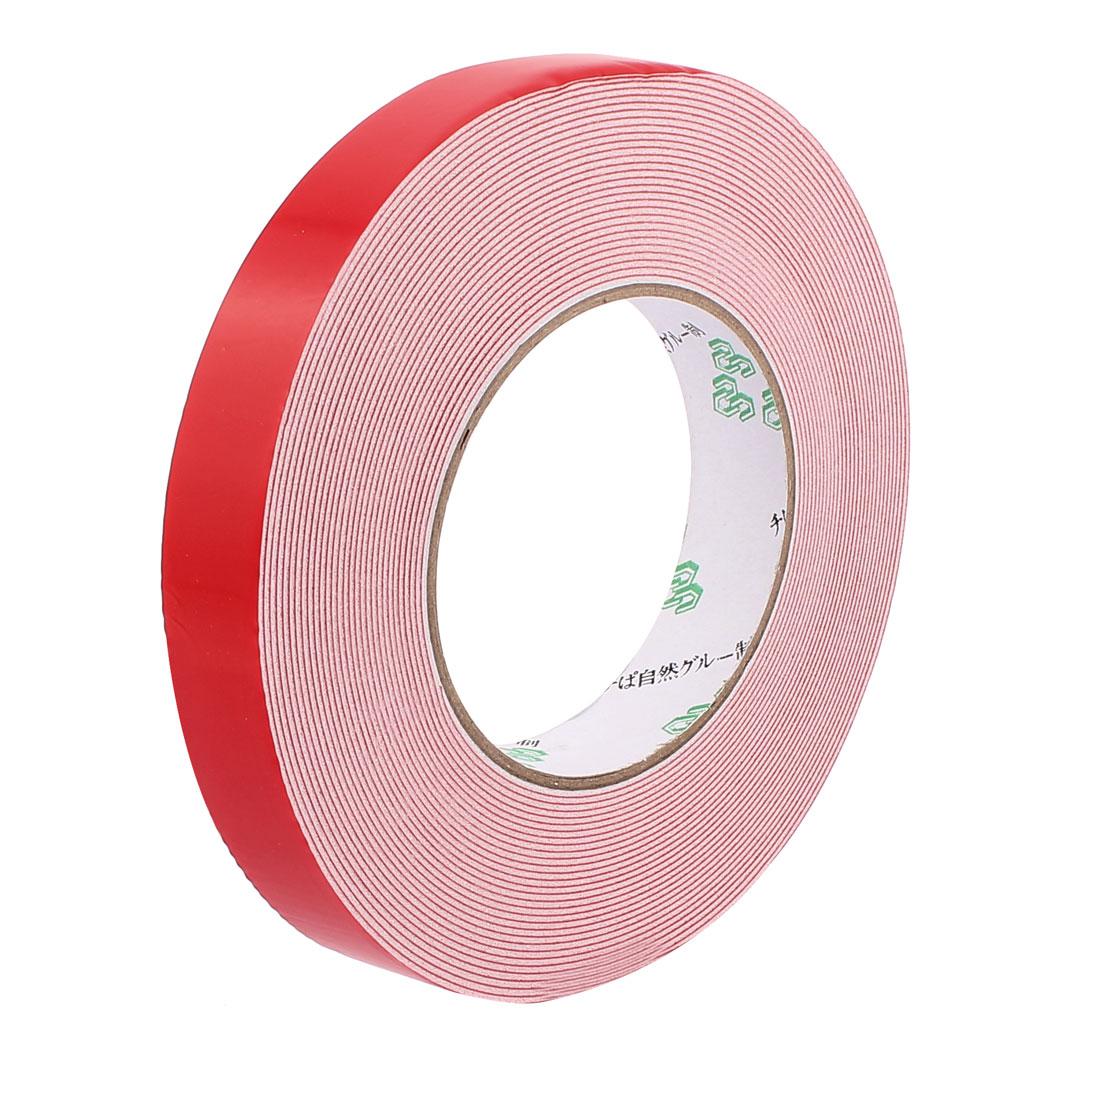 20mmx1mm Double Sided Sponge Tape Adhesive Sticker Foam Glue Strip Sealing 10M 33Ft